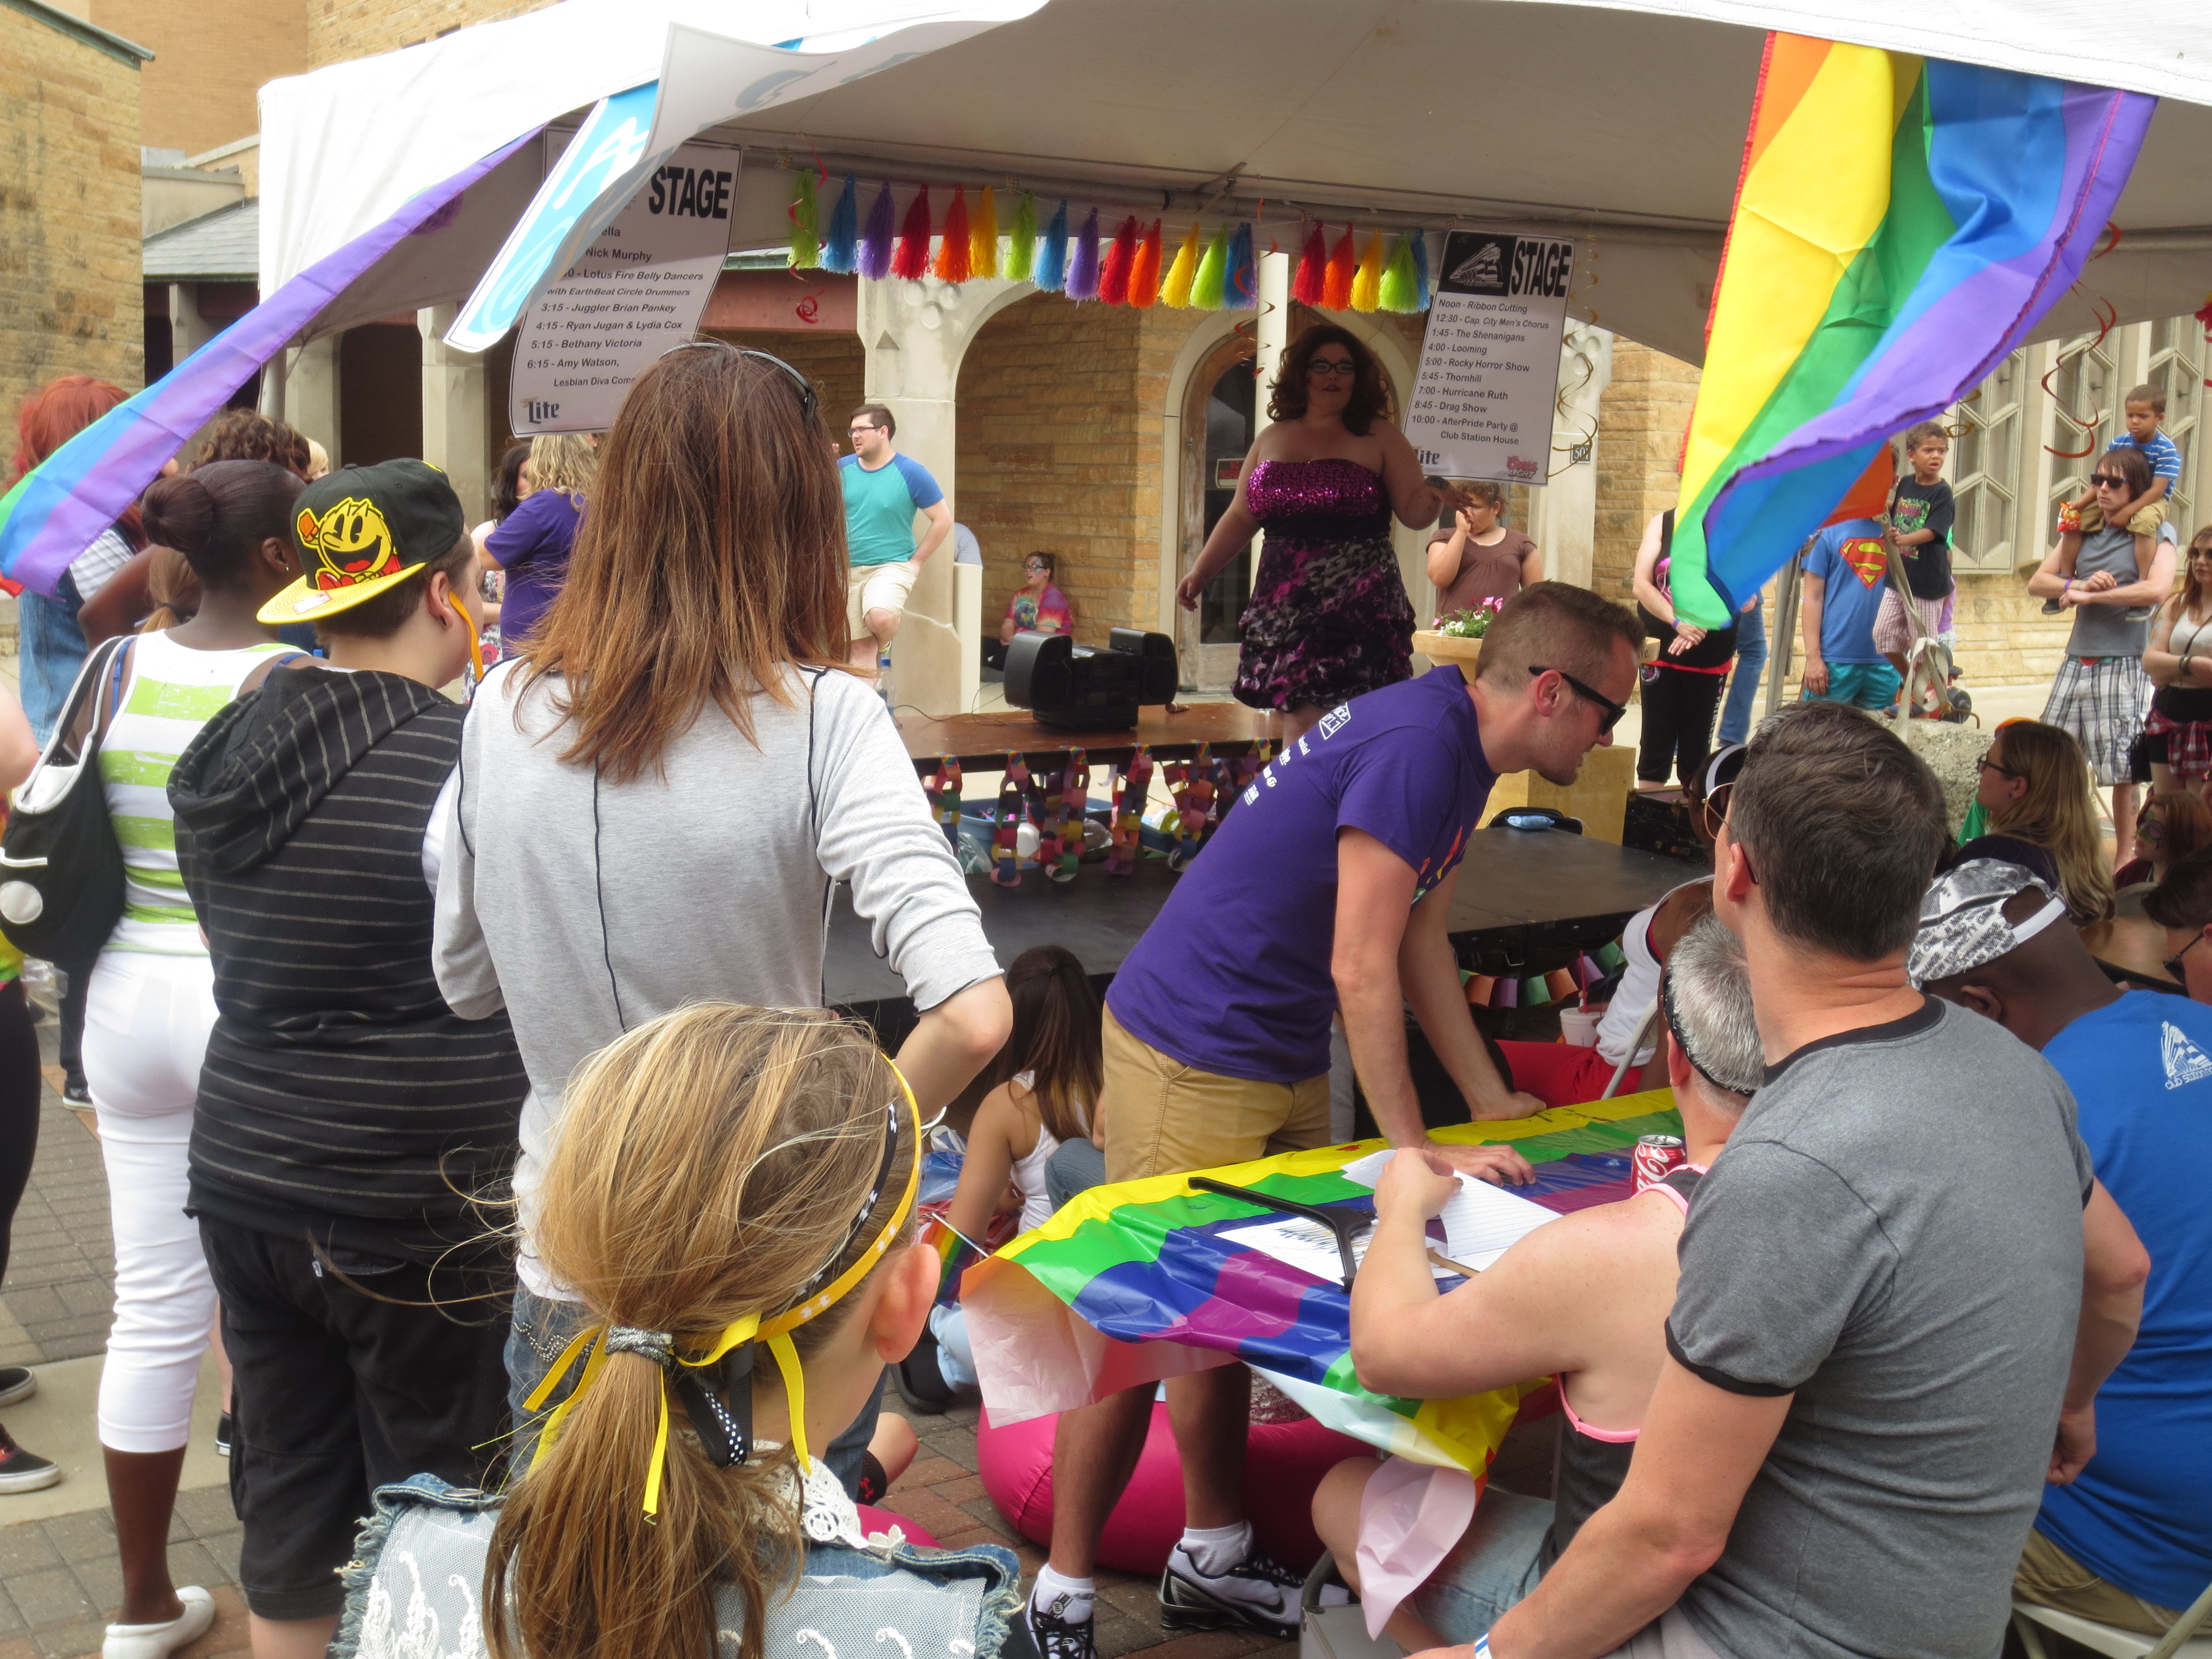 Free interracial bisexual in brooklyn